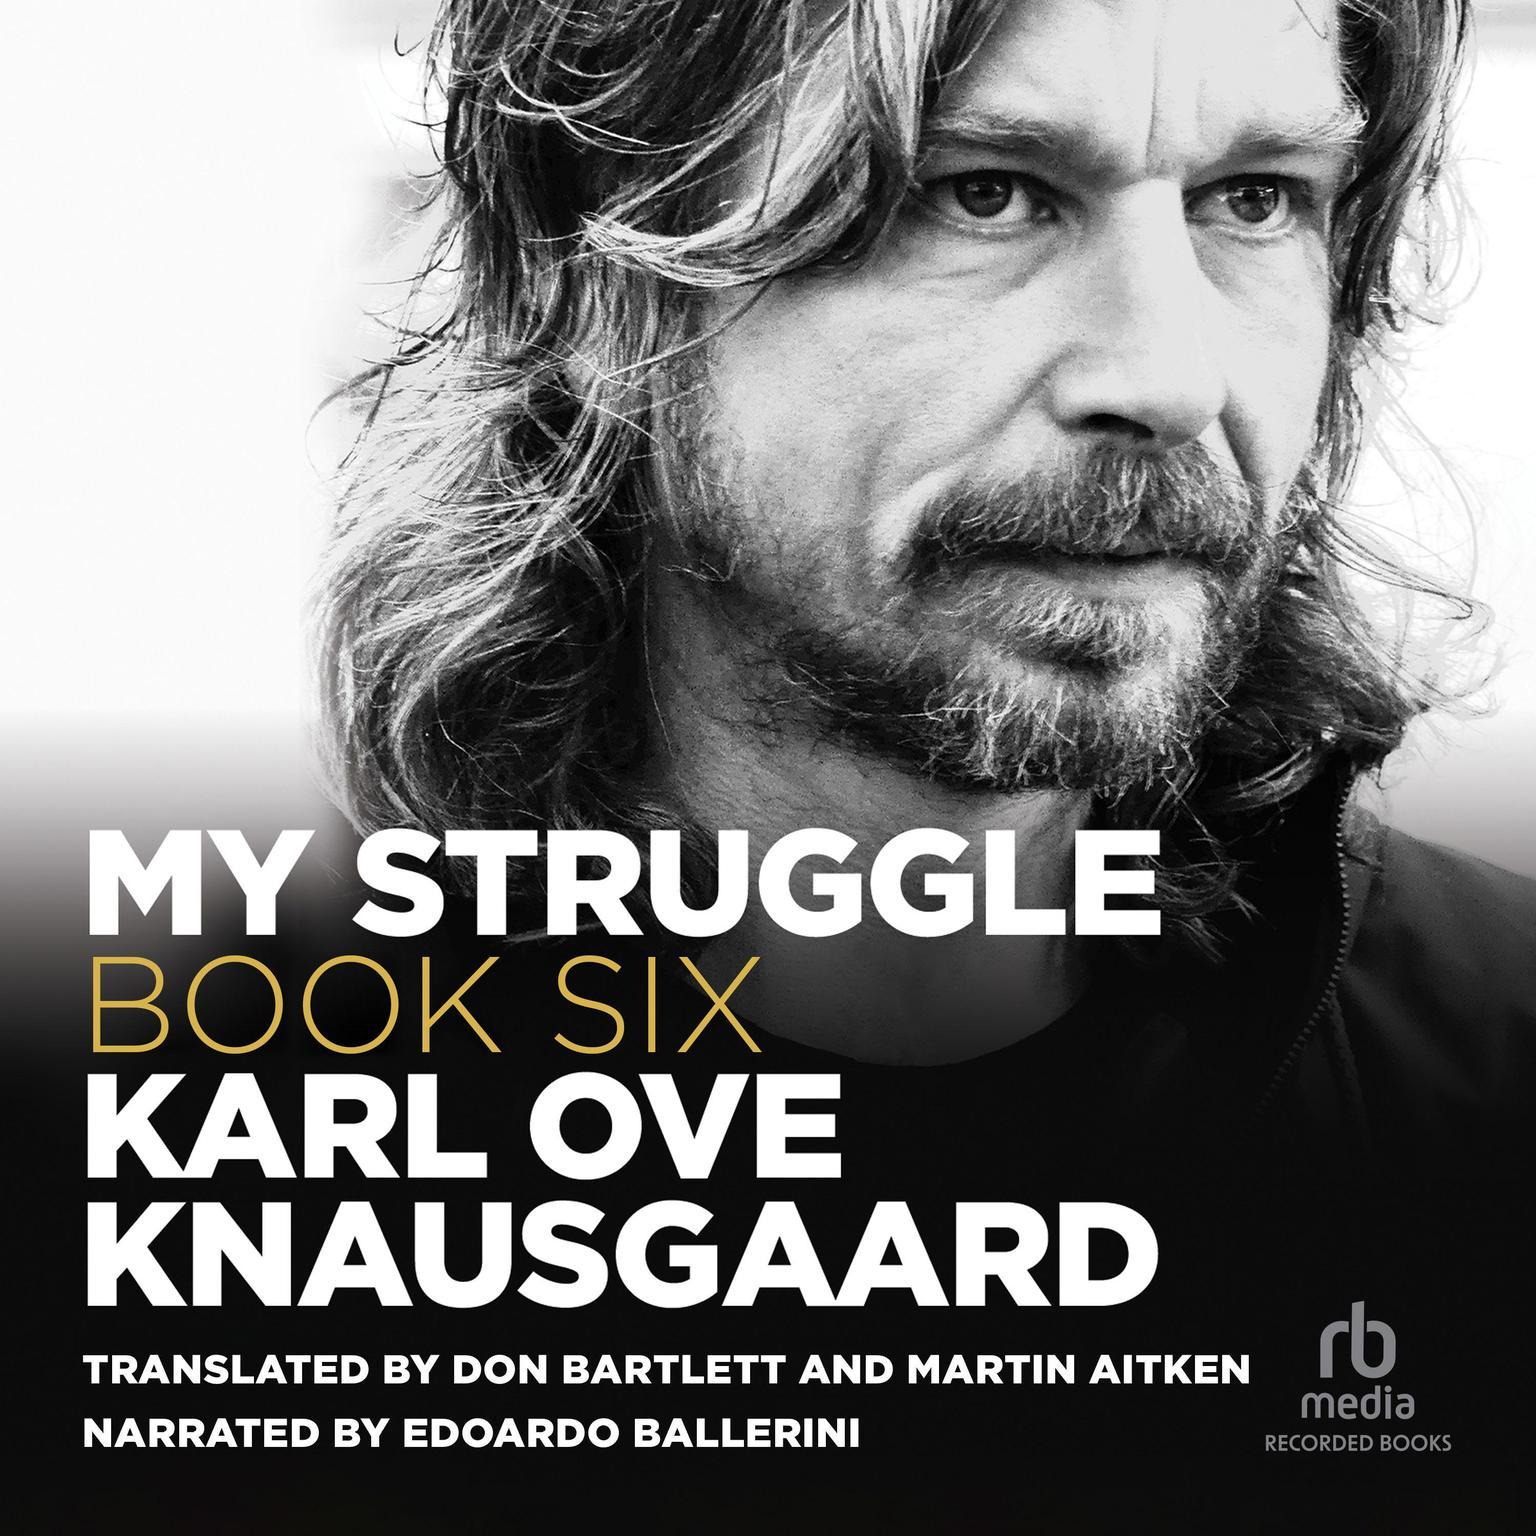 My Struggle, Book 6 Audiobook, by Karl Ove Knausgaard